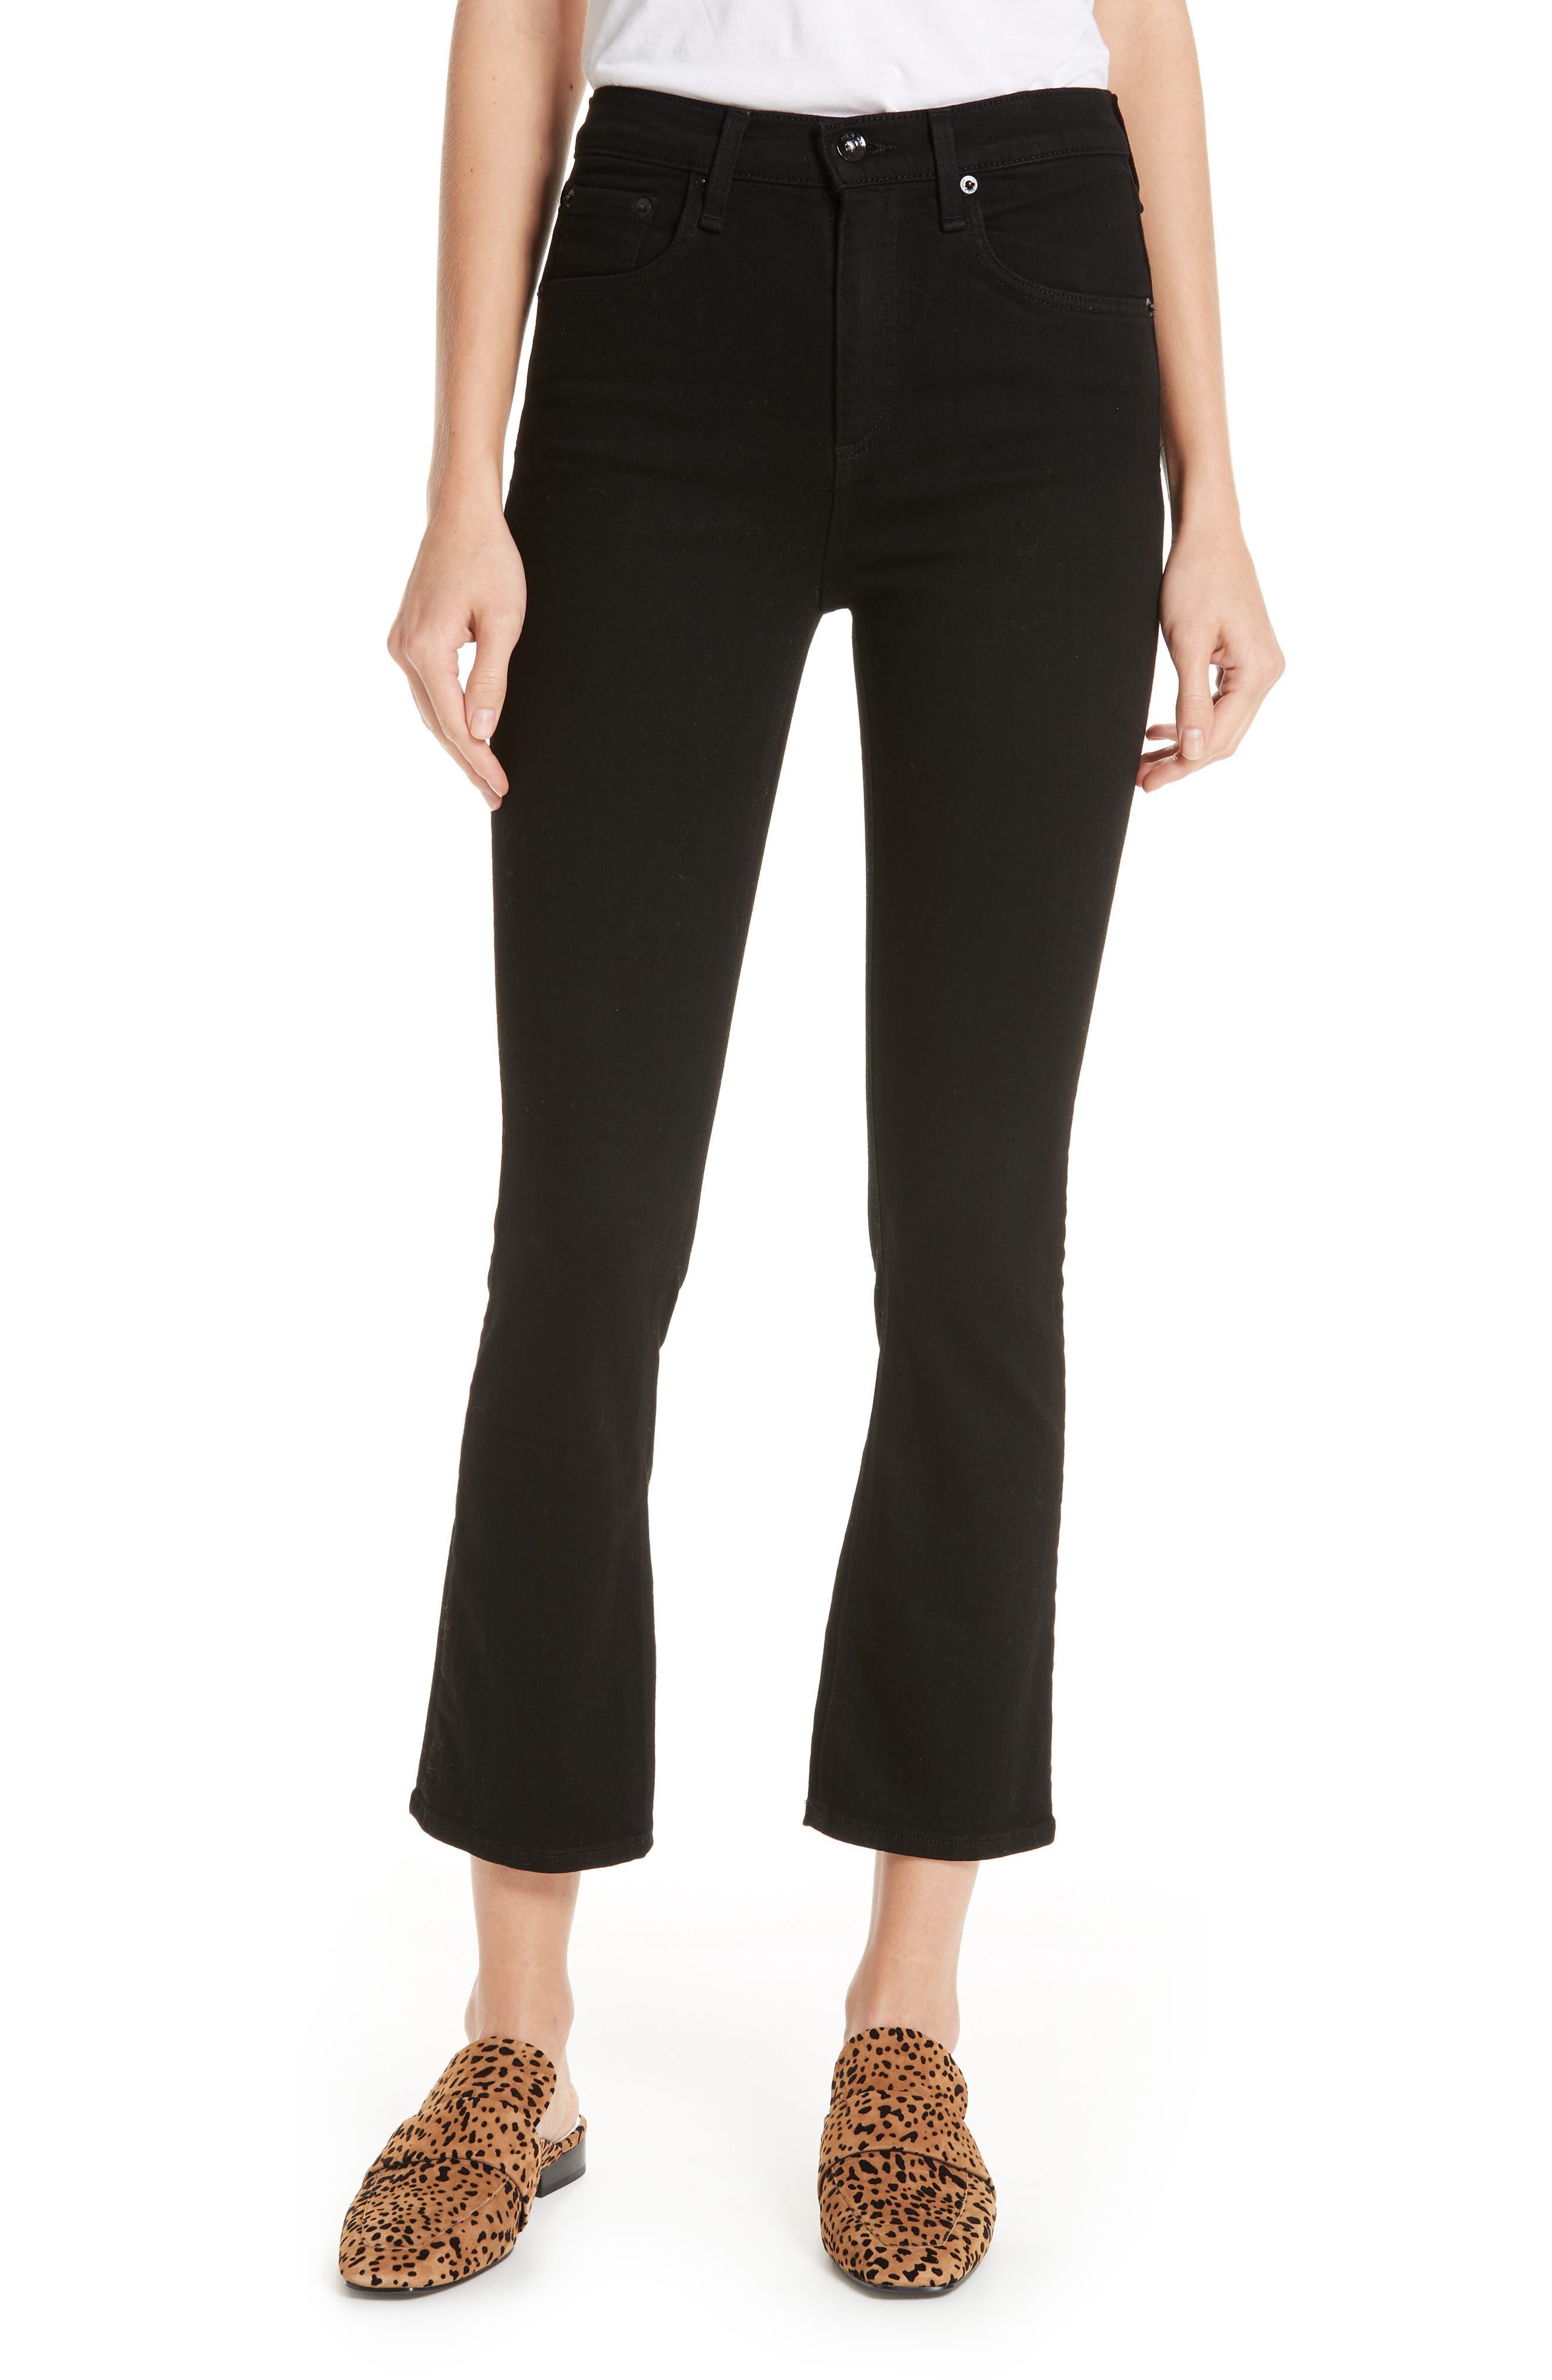 RAG & BONE,                             Hana High Waist Ankle Flare Jeans,                             Main thumbnail 1, color,                             001